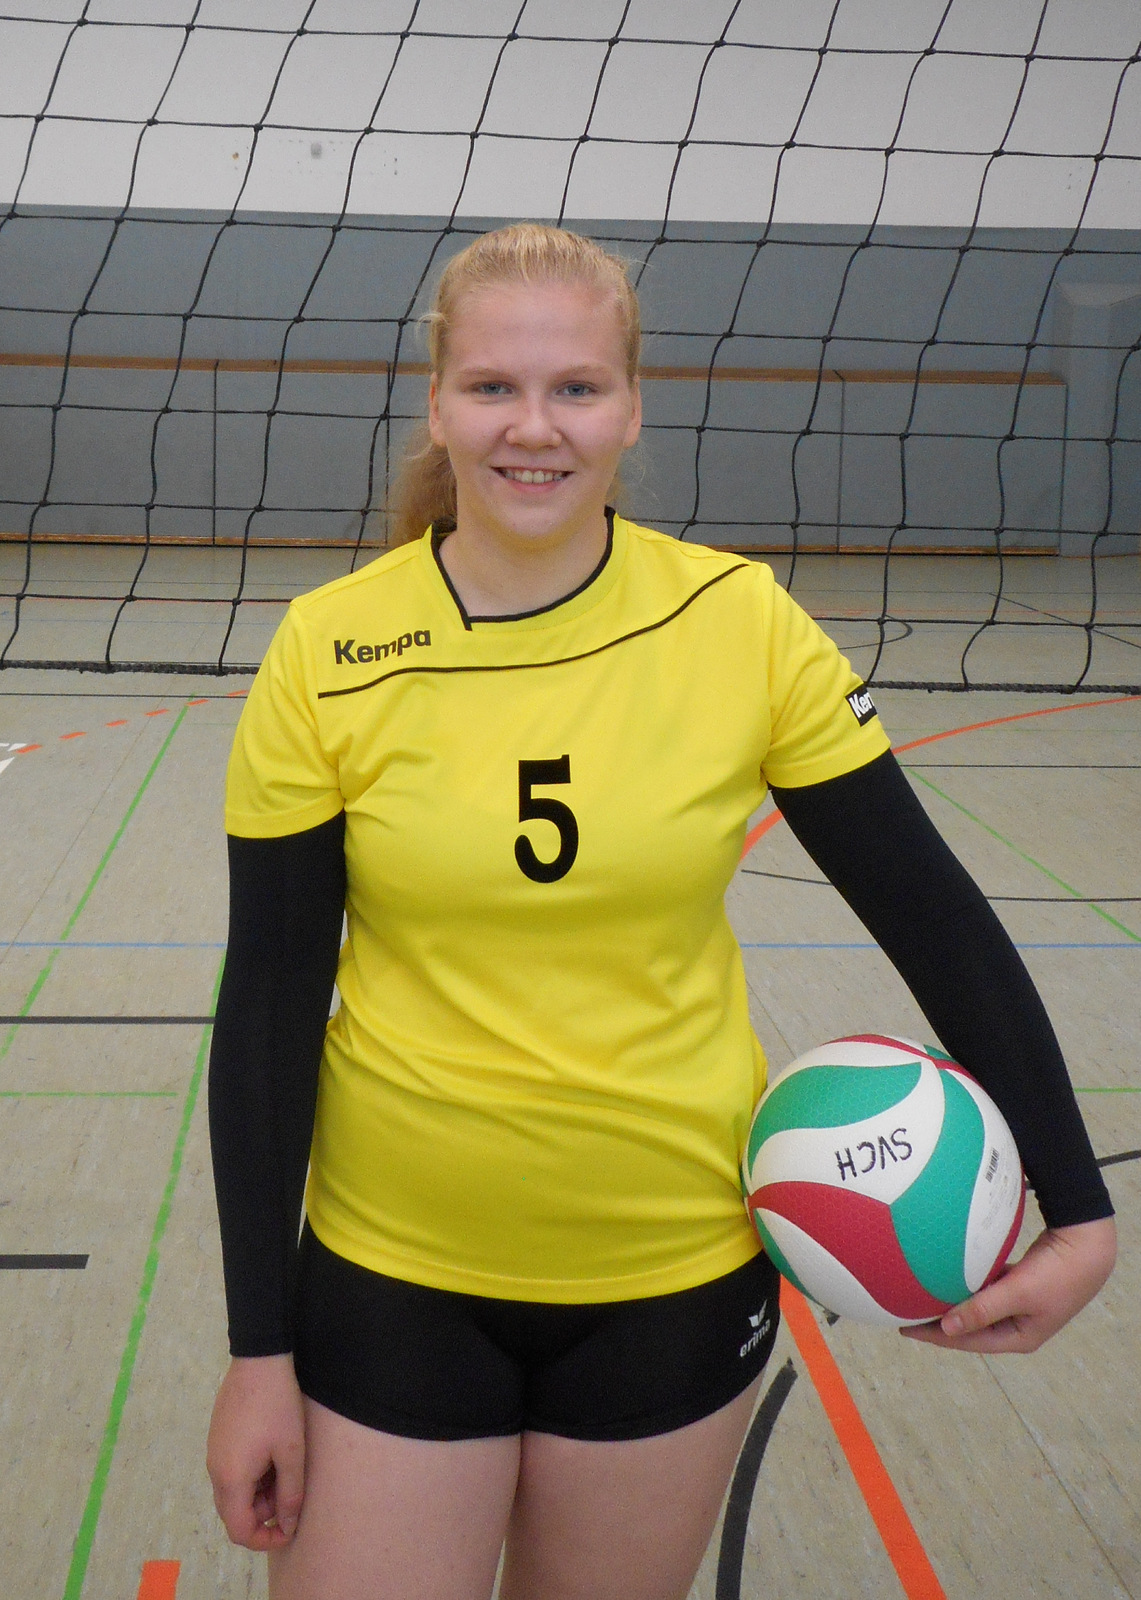 Kiara Kruschke